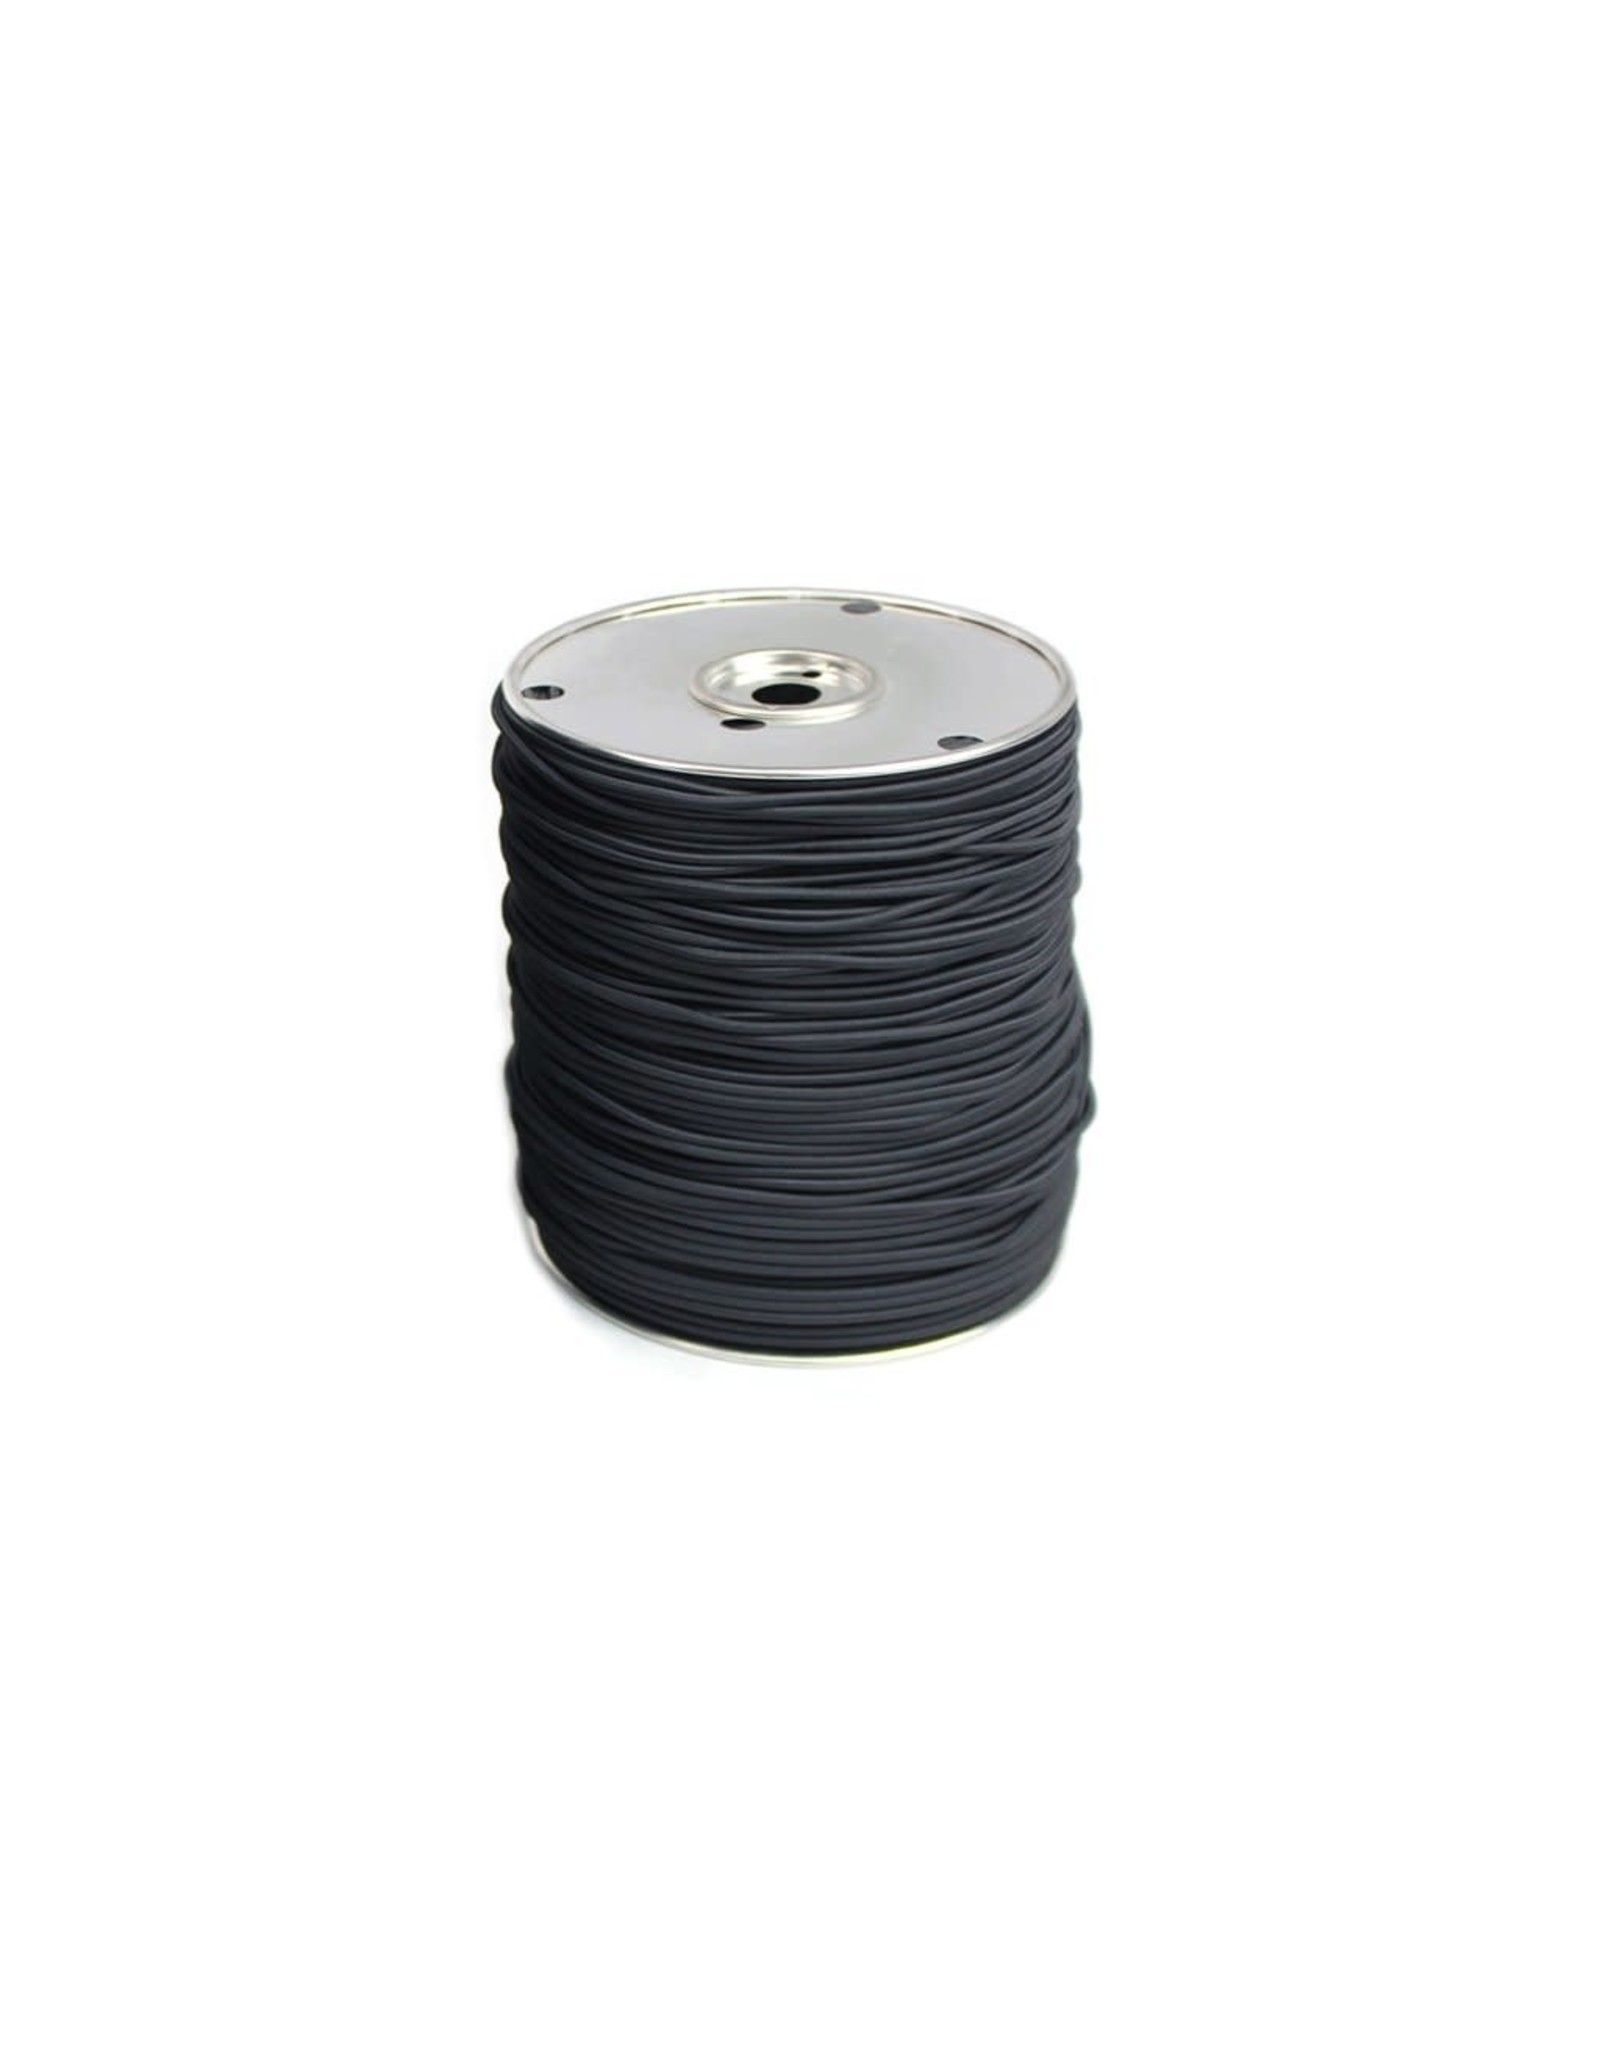 Atlan Atlan corde élastique rond 3,2 mm (Bungee)  au pied